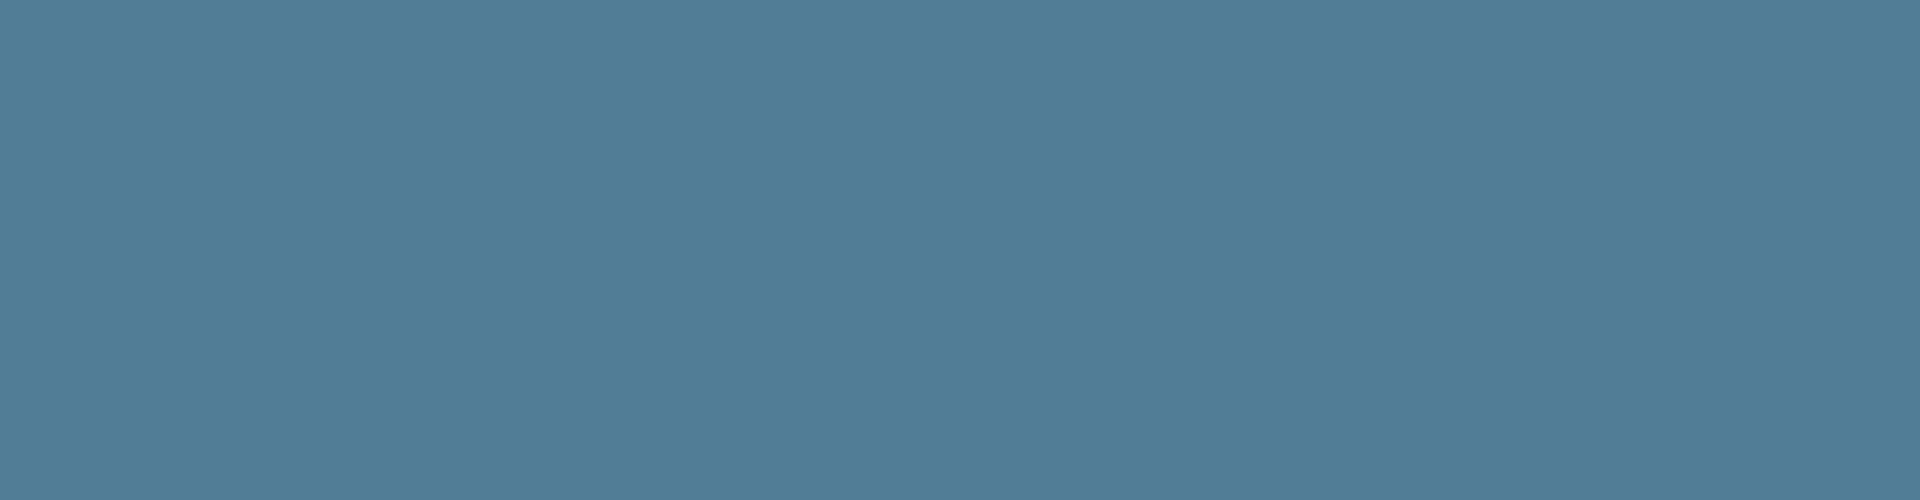 Logo-Color-3.jpg